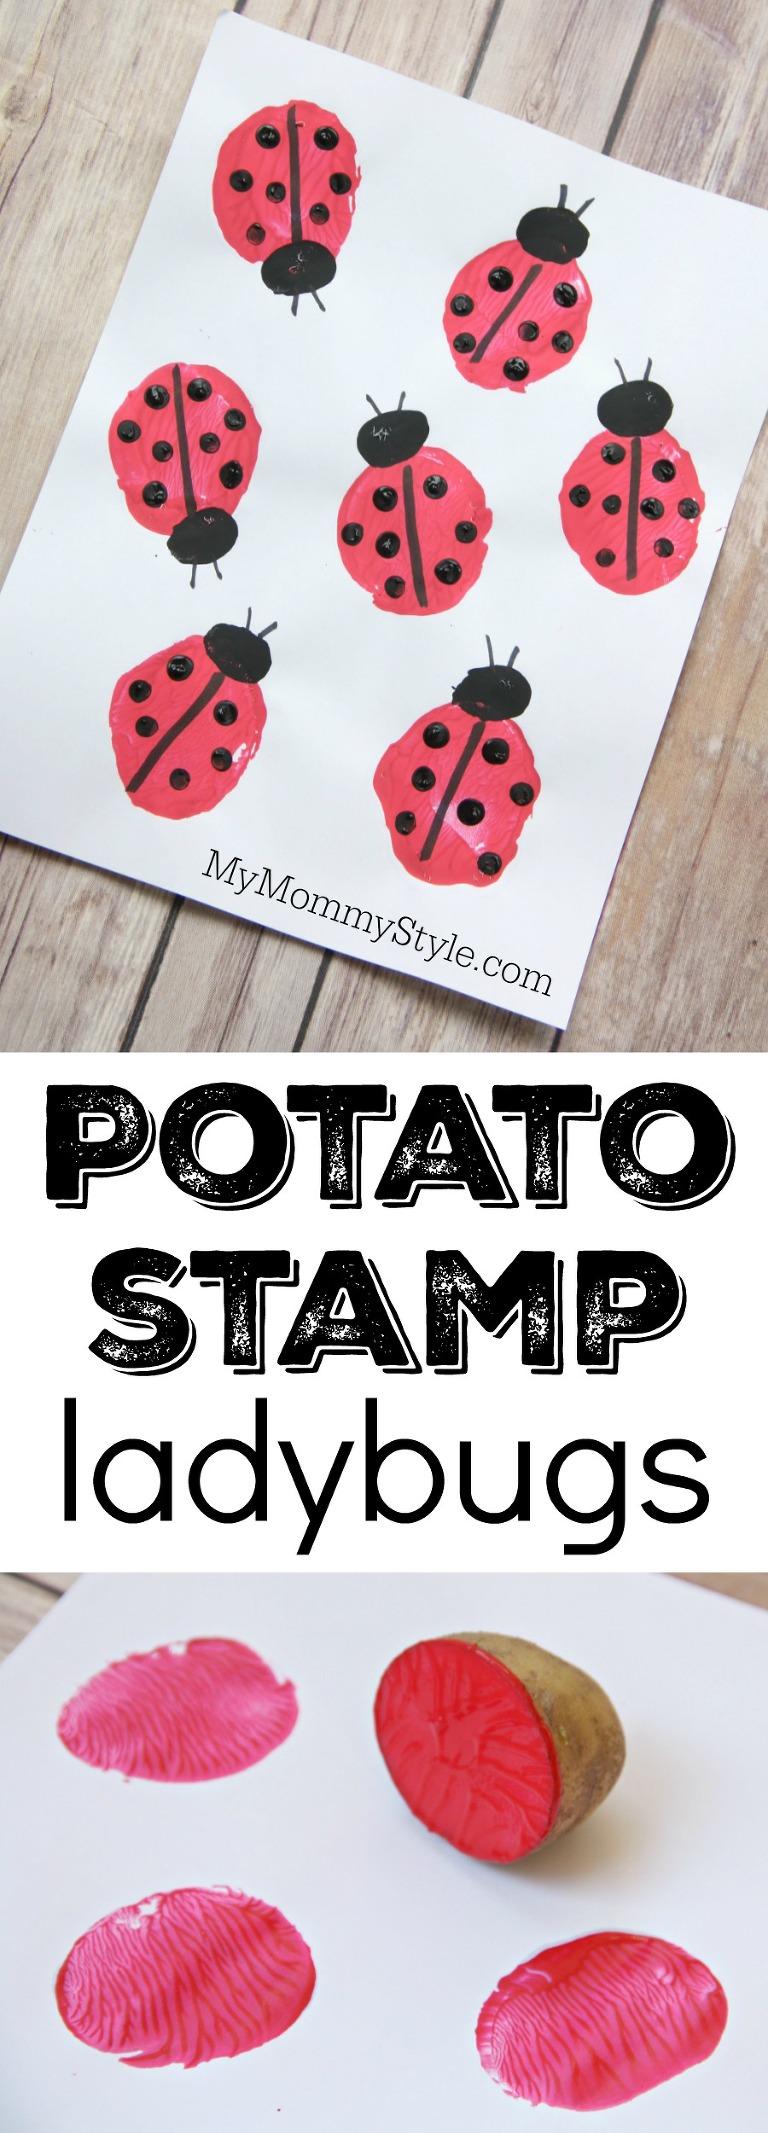 Potato stamp ladybugs